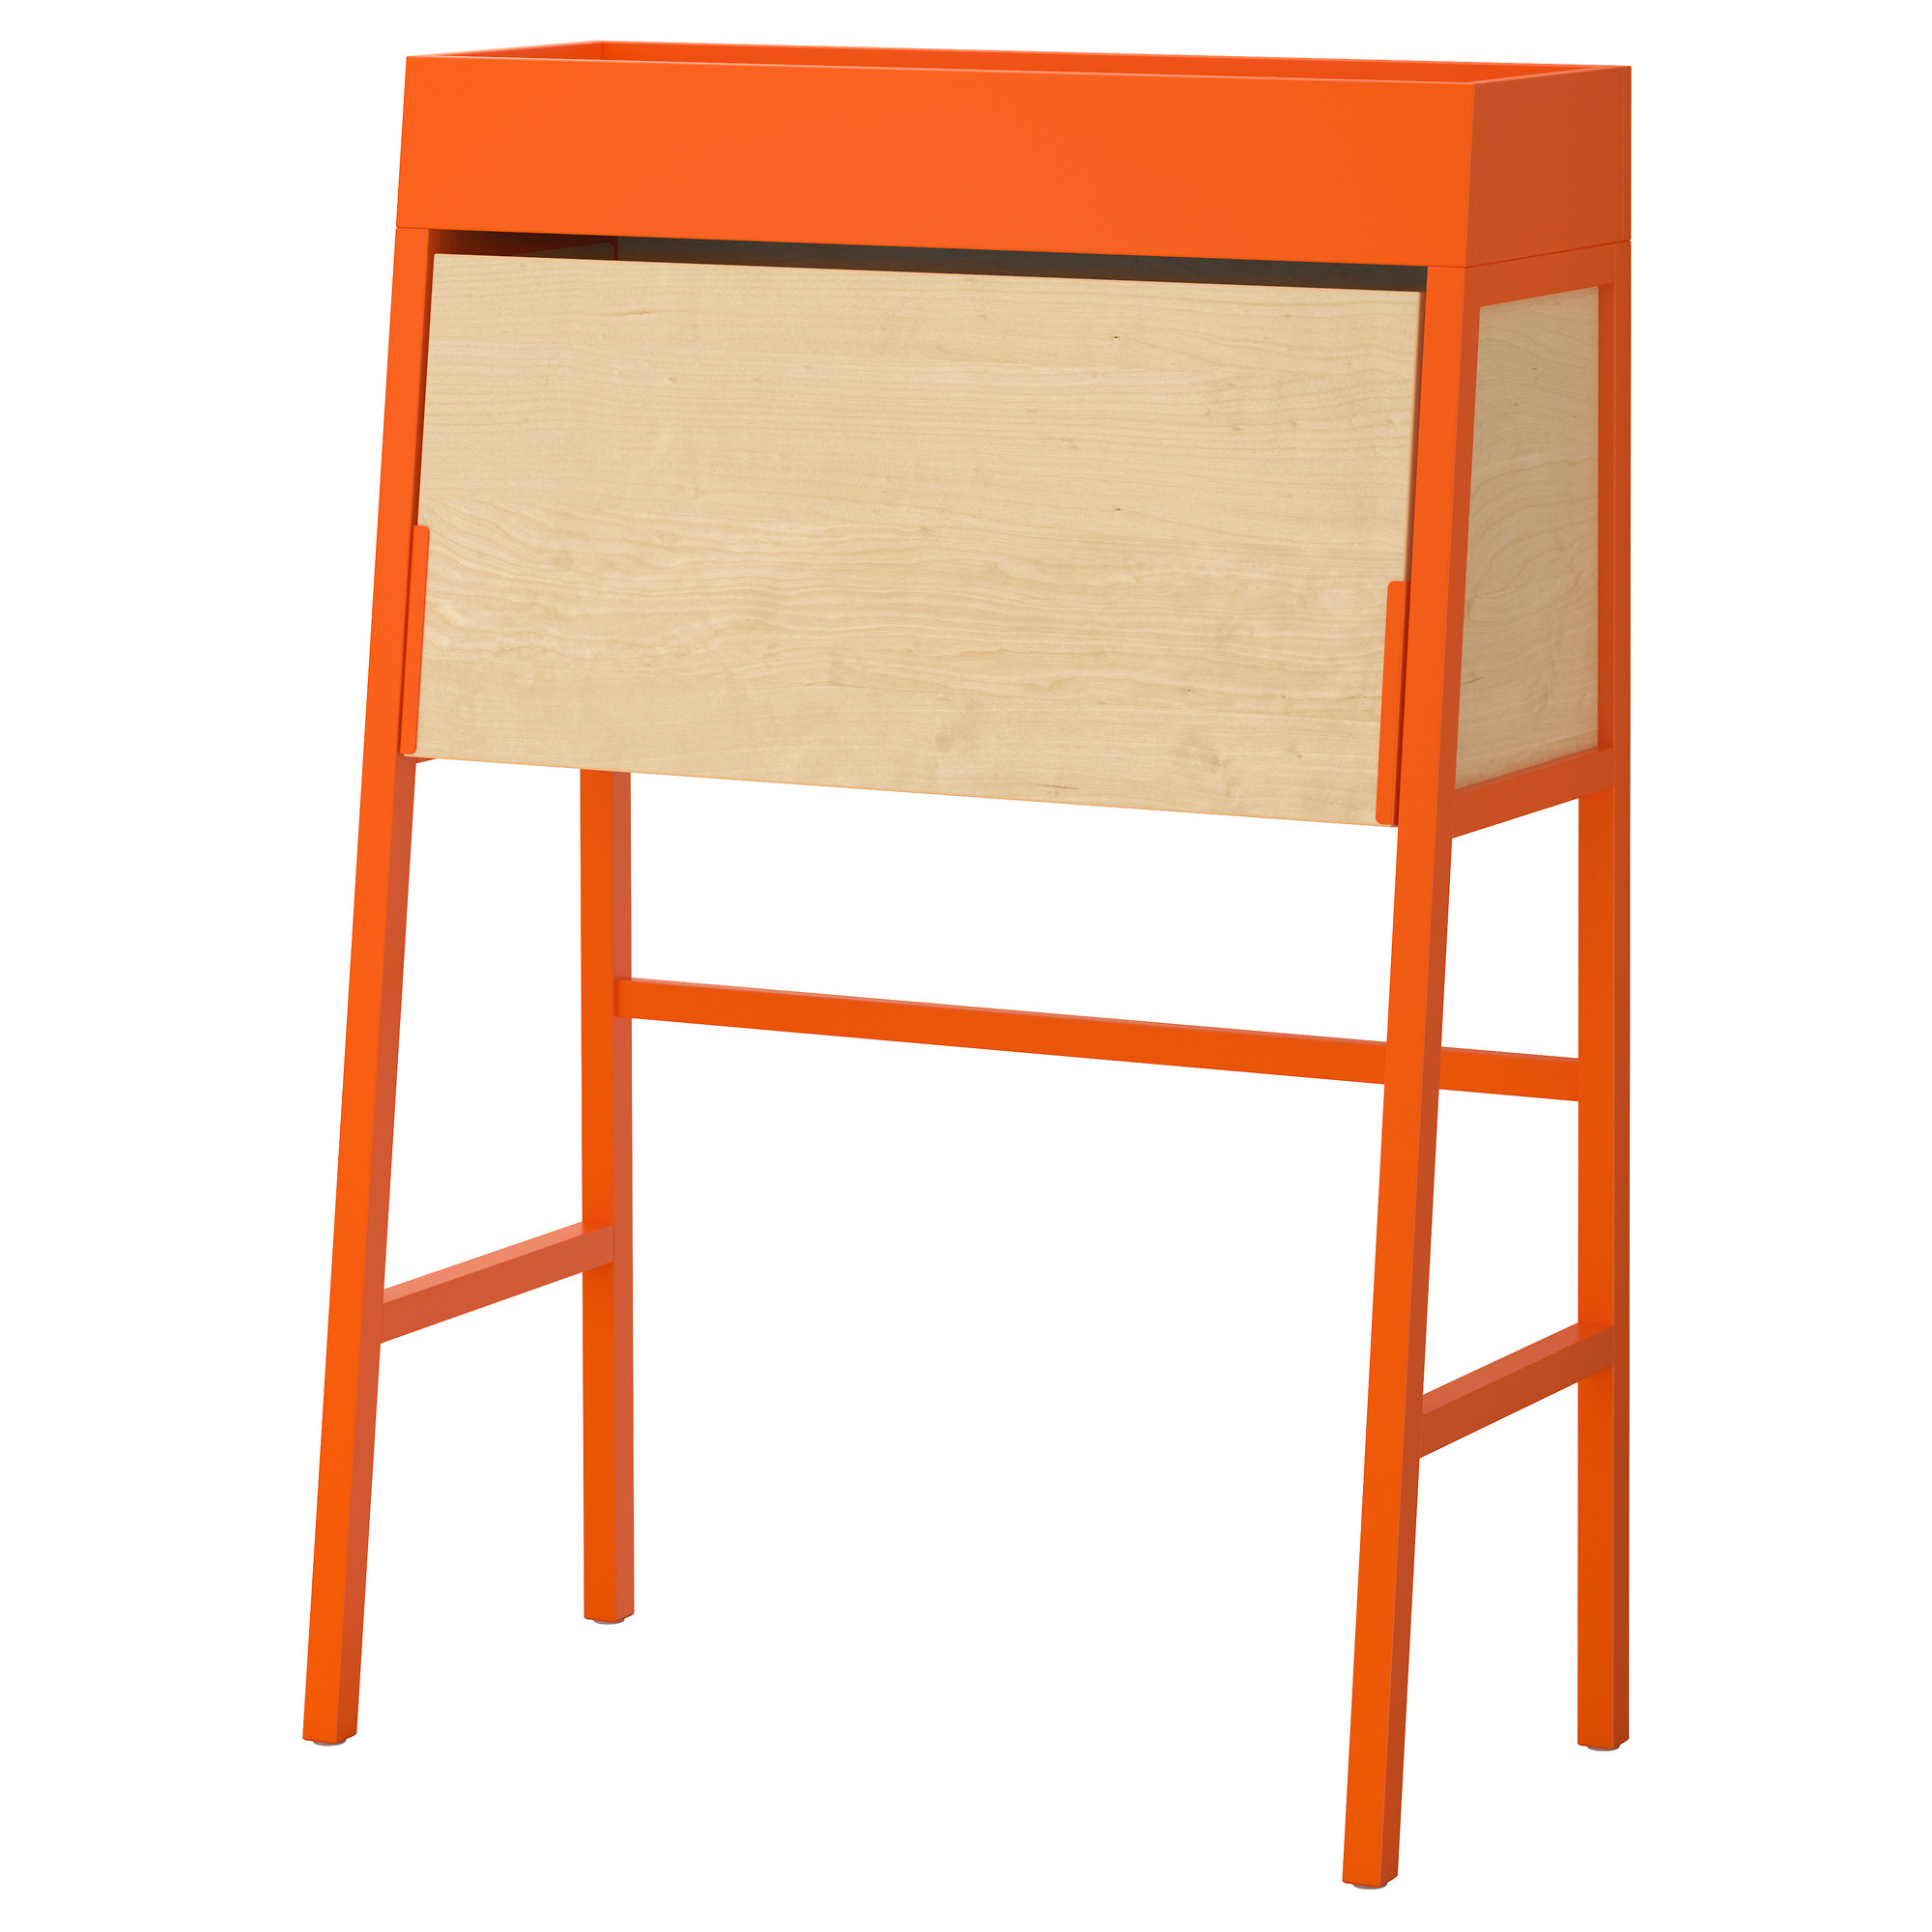 Furniture and Home Furnishings | Ikea catalog, Ikea ps 2014